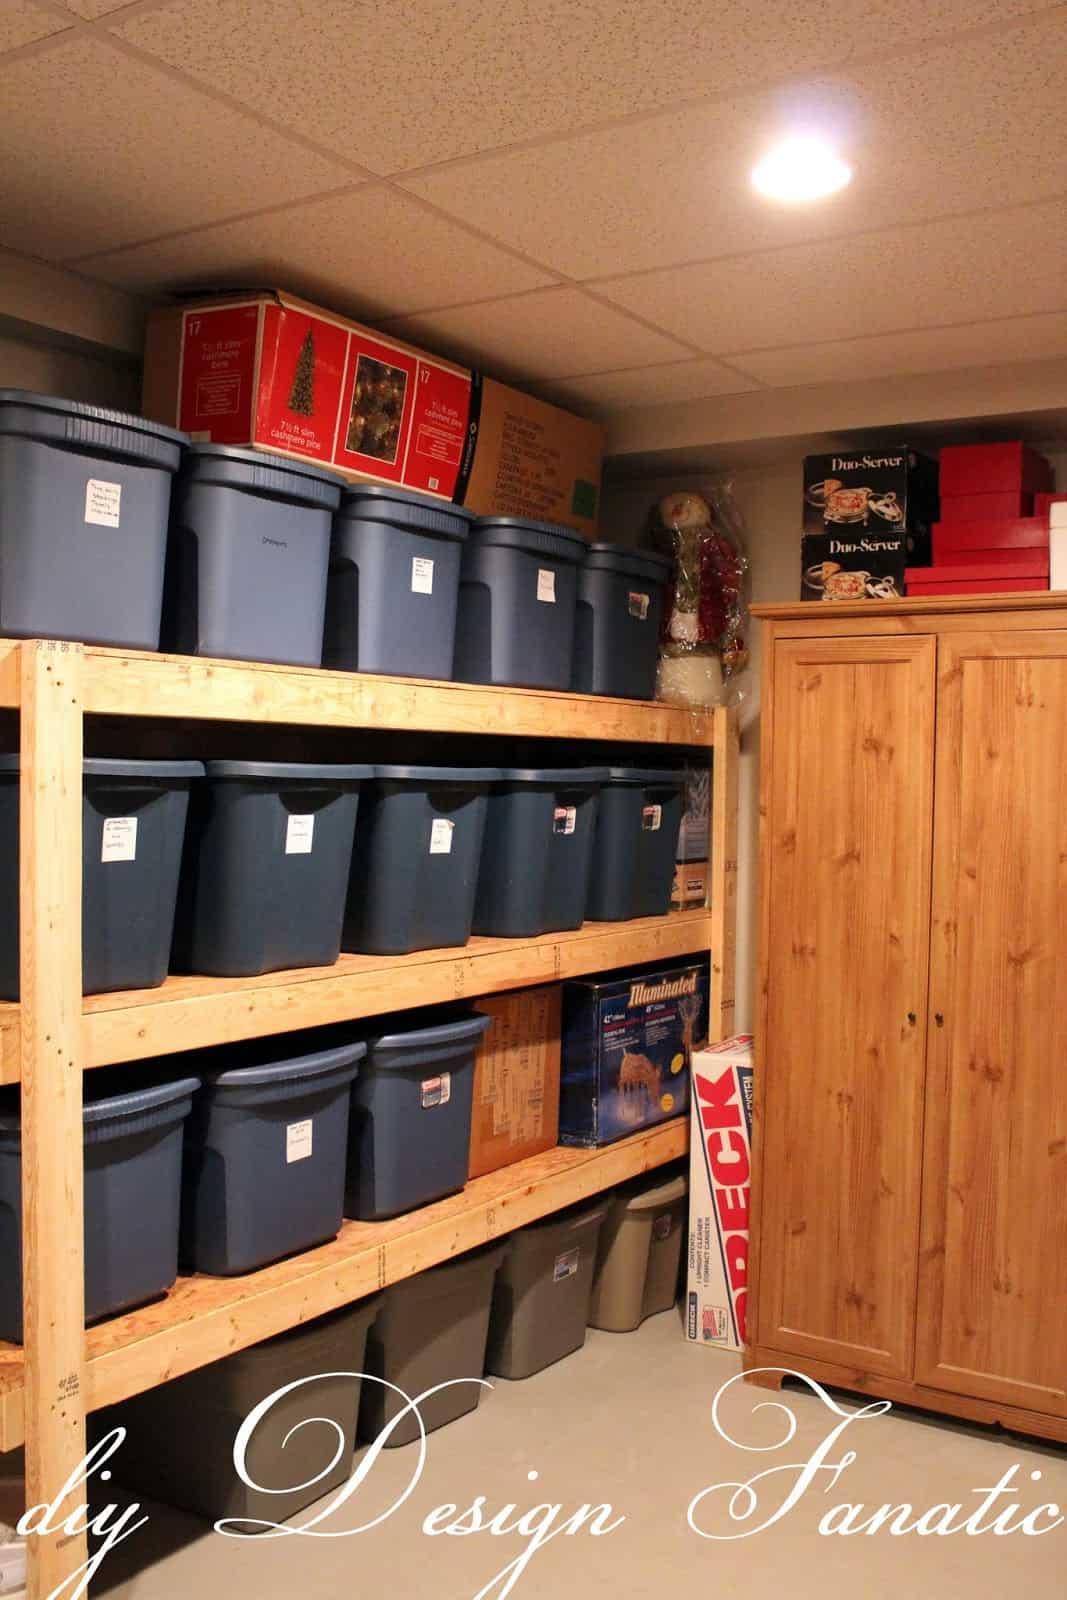 Diy shelf and plastic bins storage